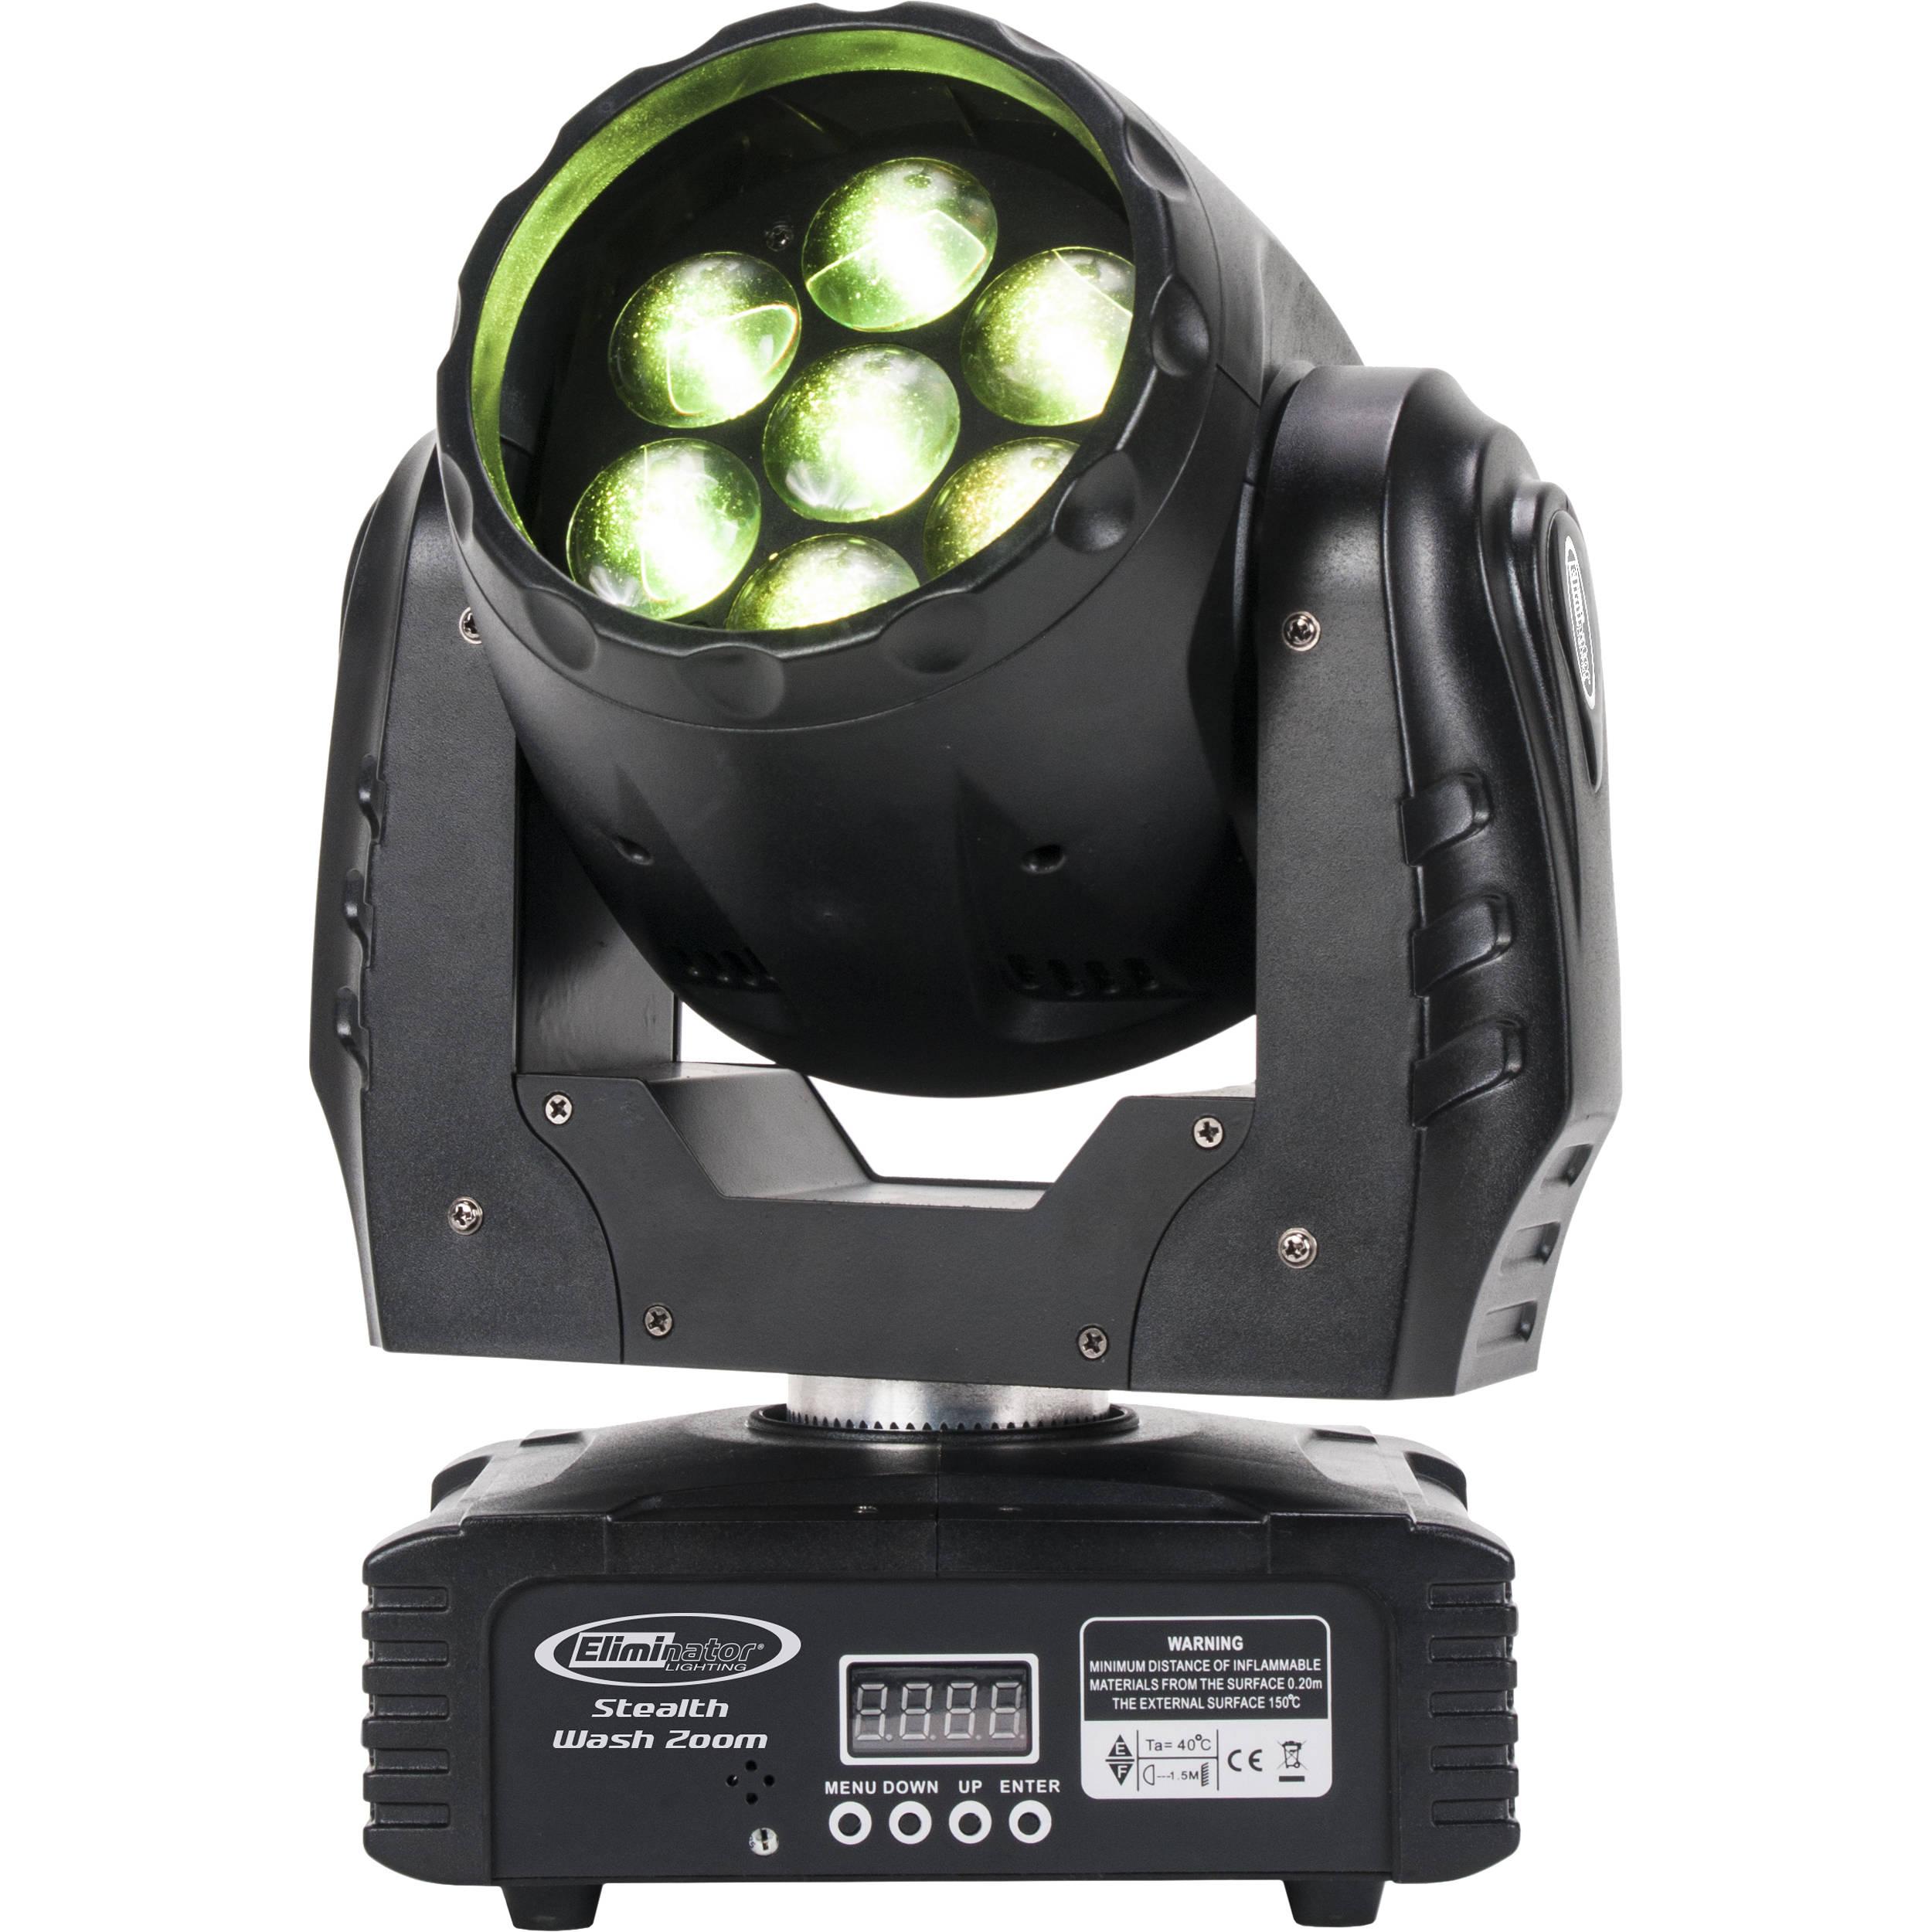 Eliminator Lighting Stealth Wash Zoom Led Bh Versatile Emergency Lamp Moving Head Light